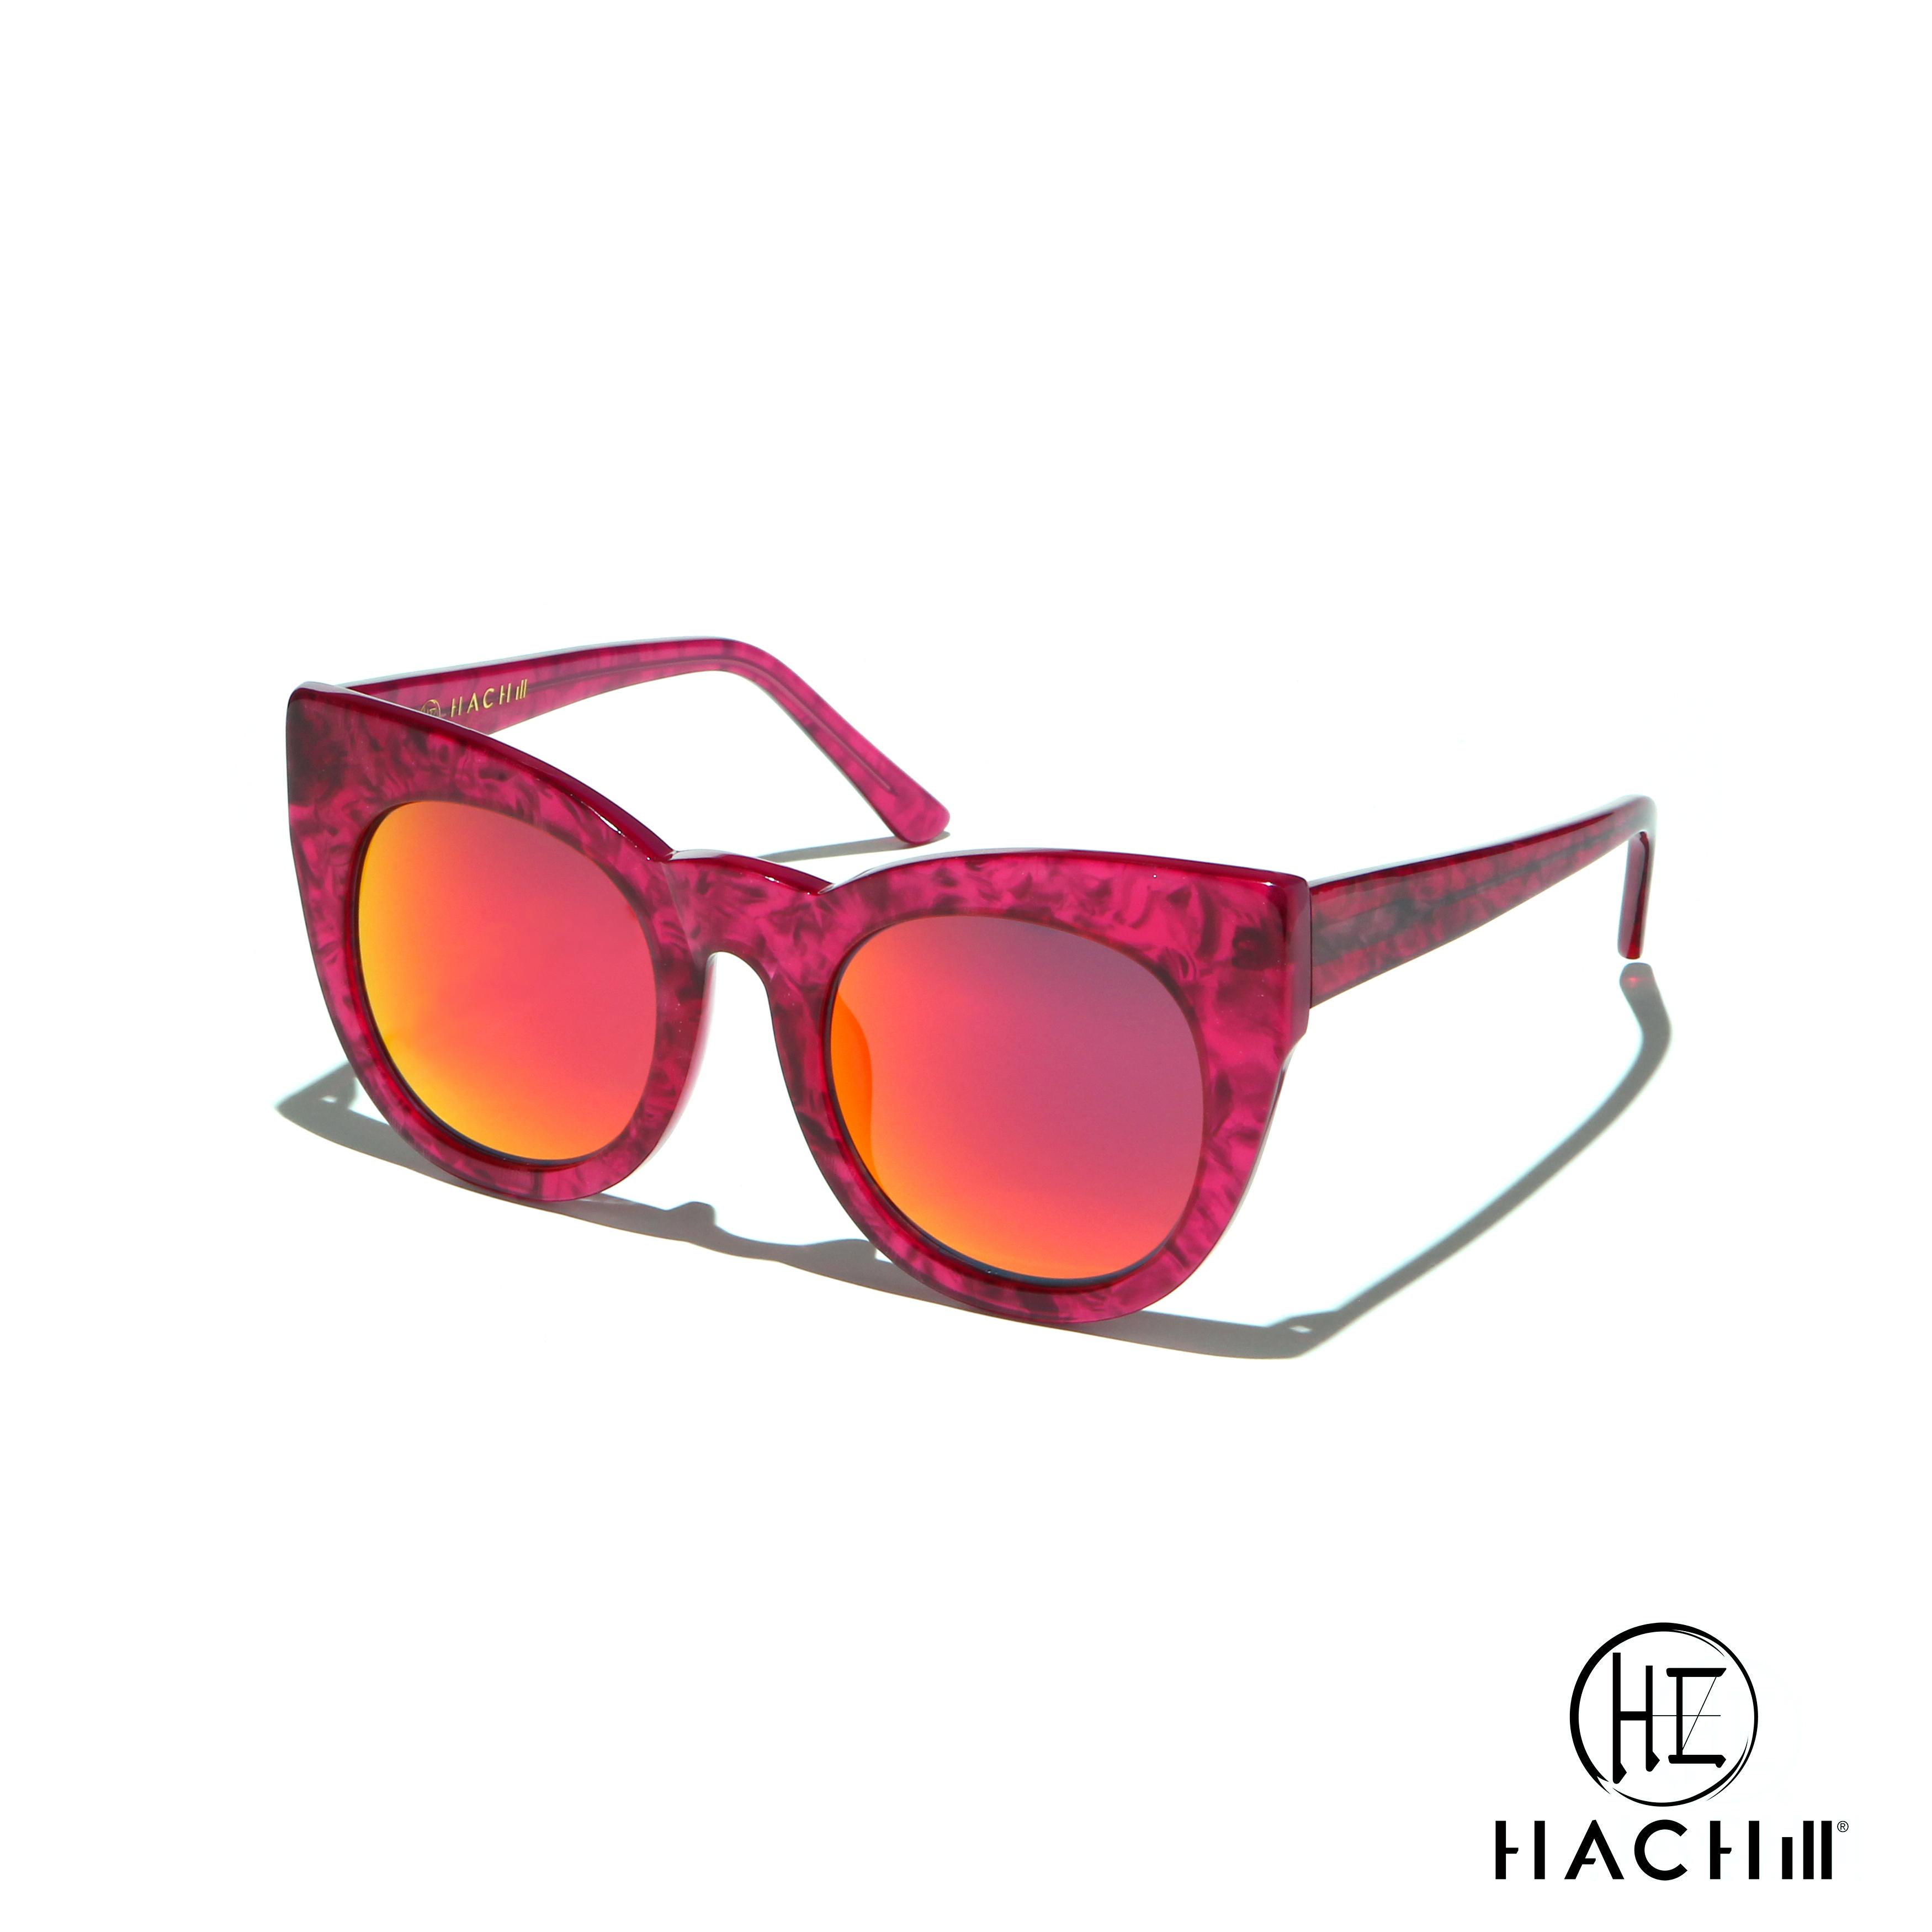 Hachill 太阳眼镜 HC8221S-C4 粉红色